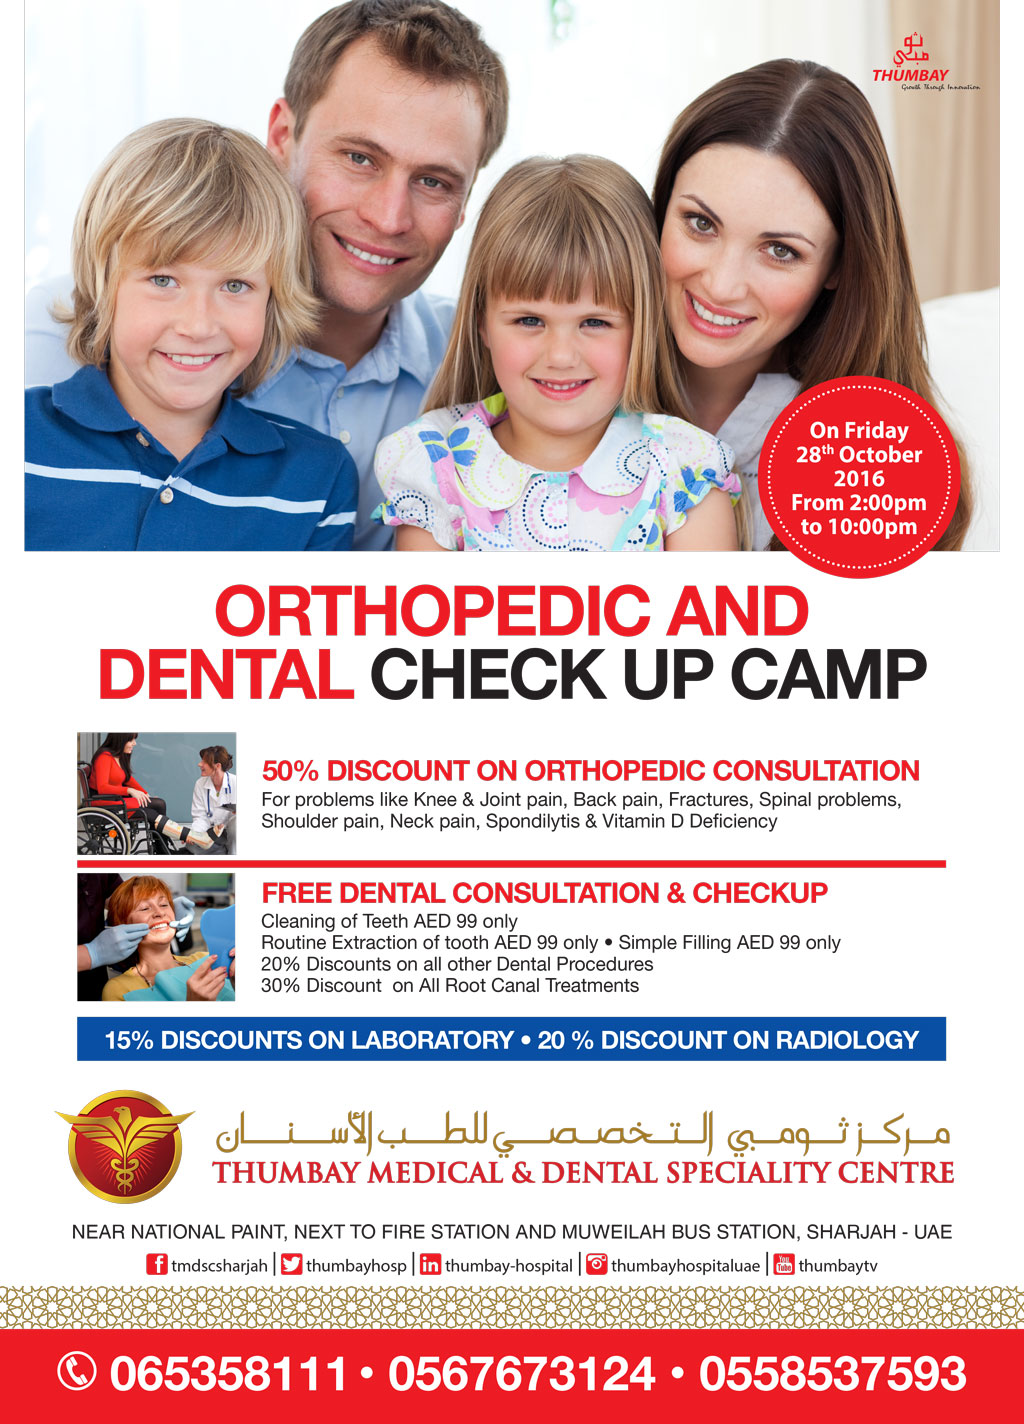 Orthopedic & Dental Check up Camp